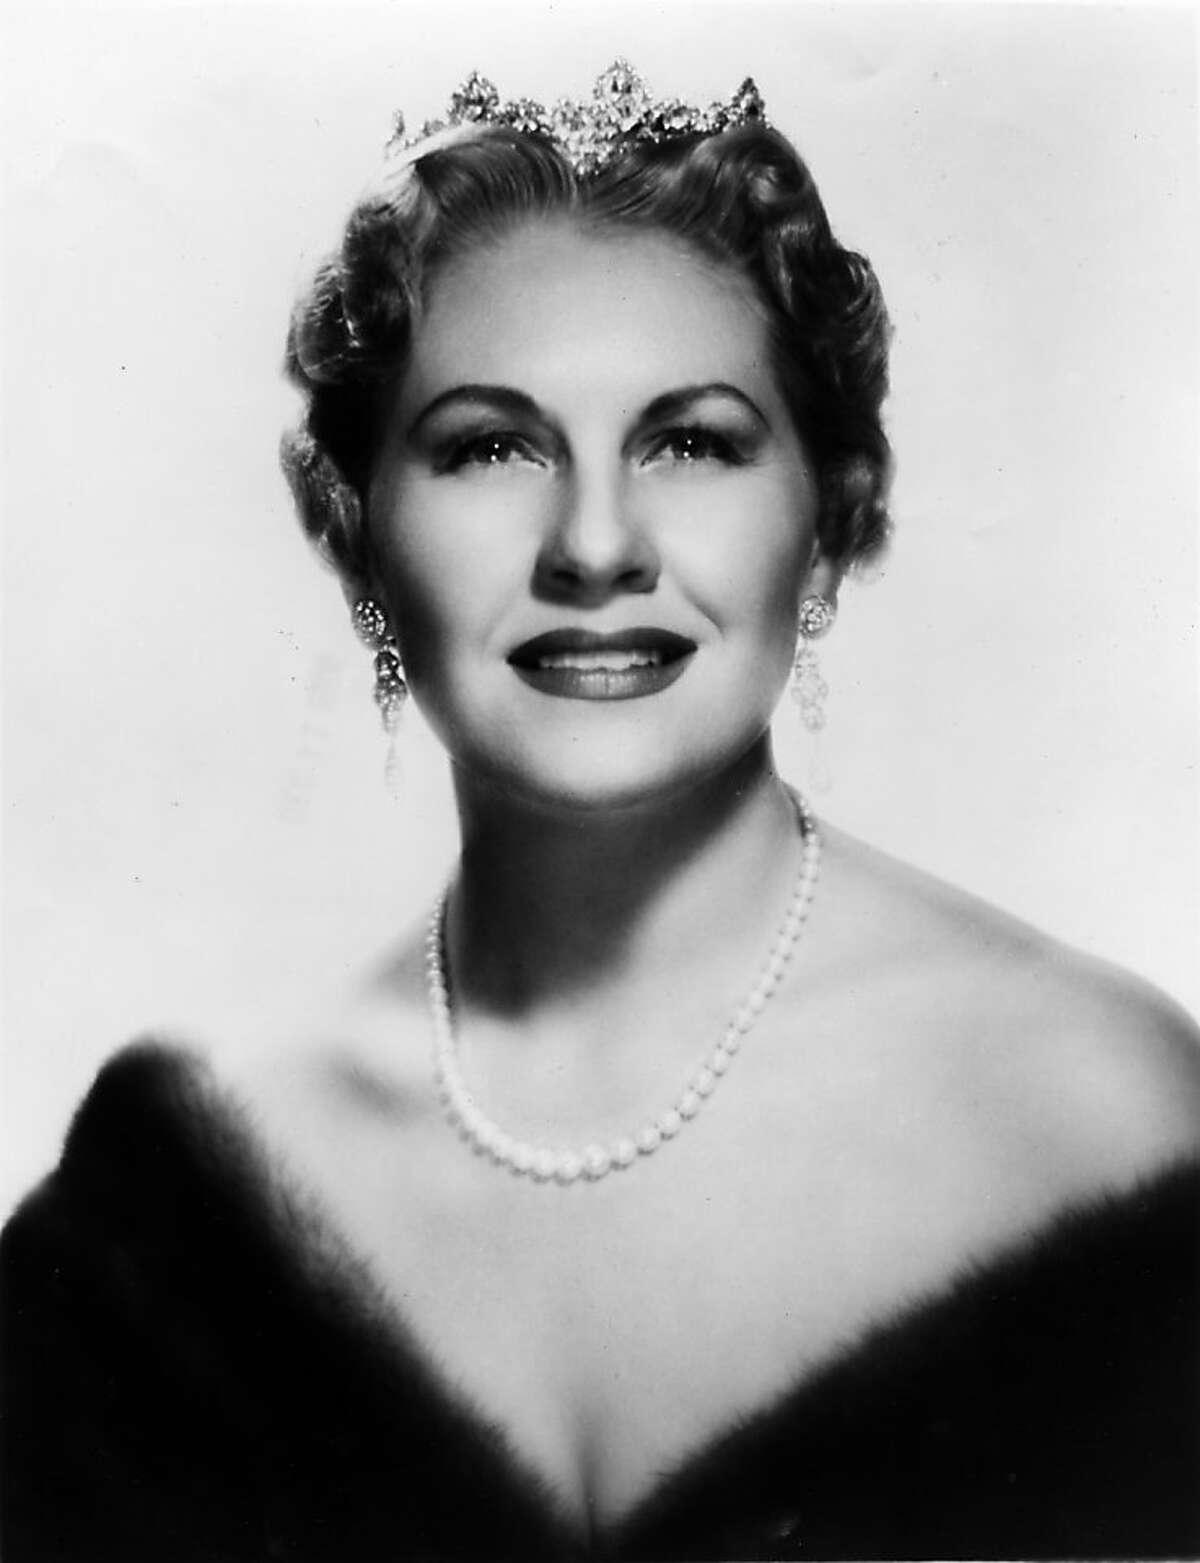 Claramae Turner Hoffmann, contralto. December 11, 1955.